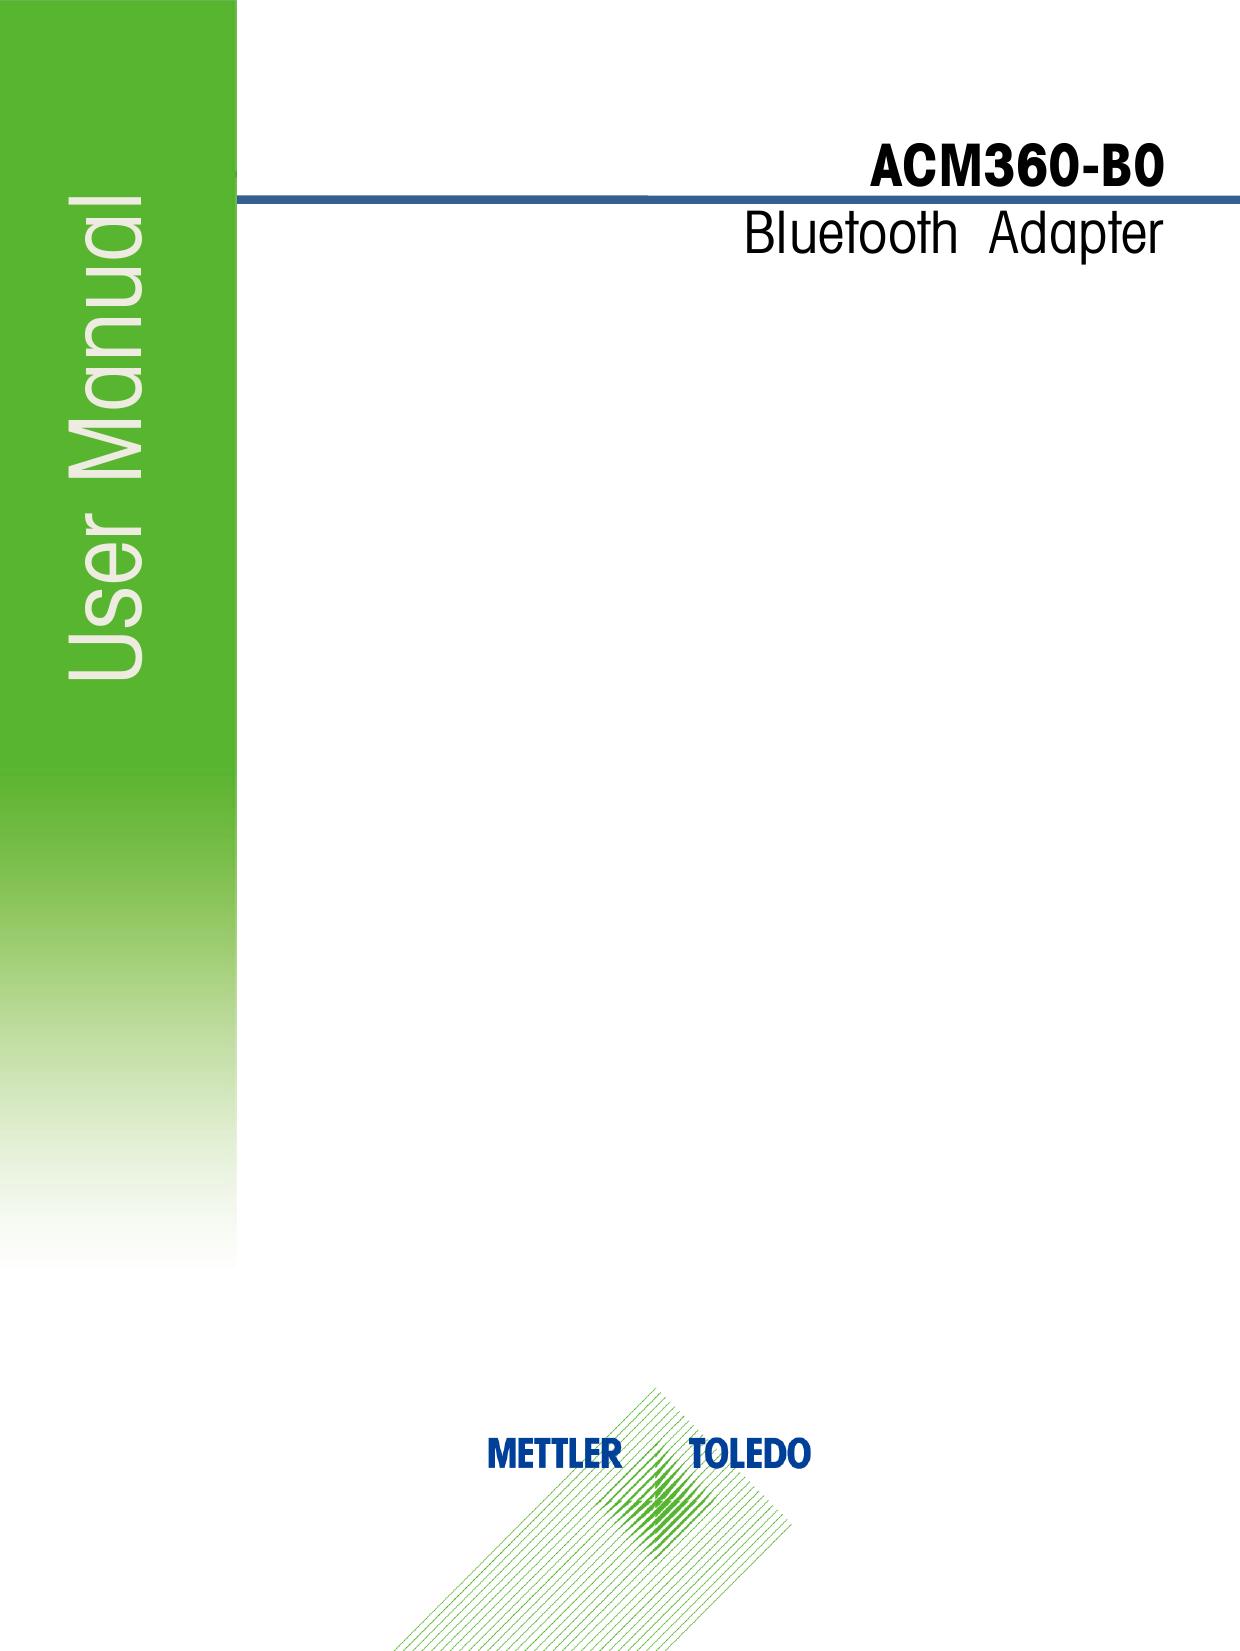 User Manual ACM360-B0 Bluetooth  Adapter